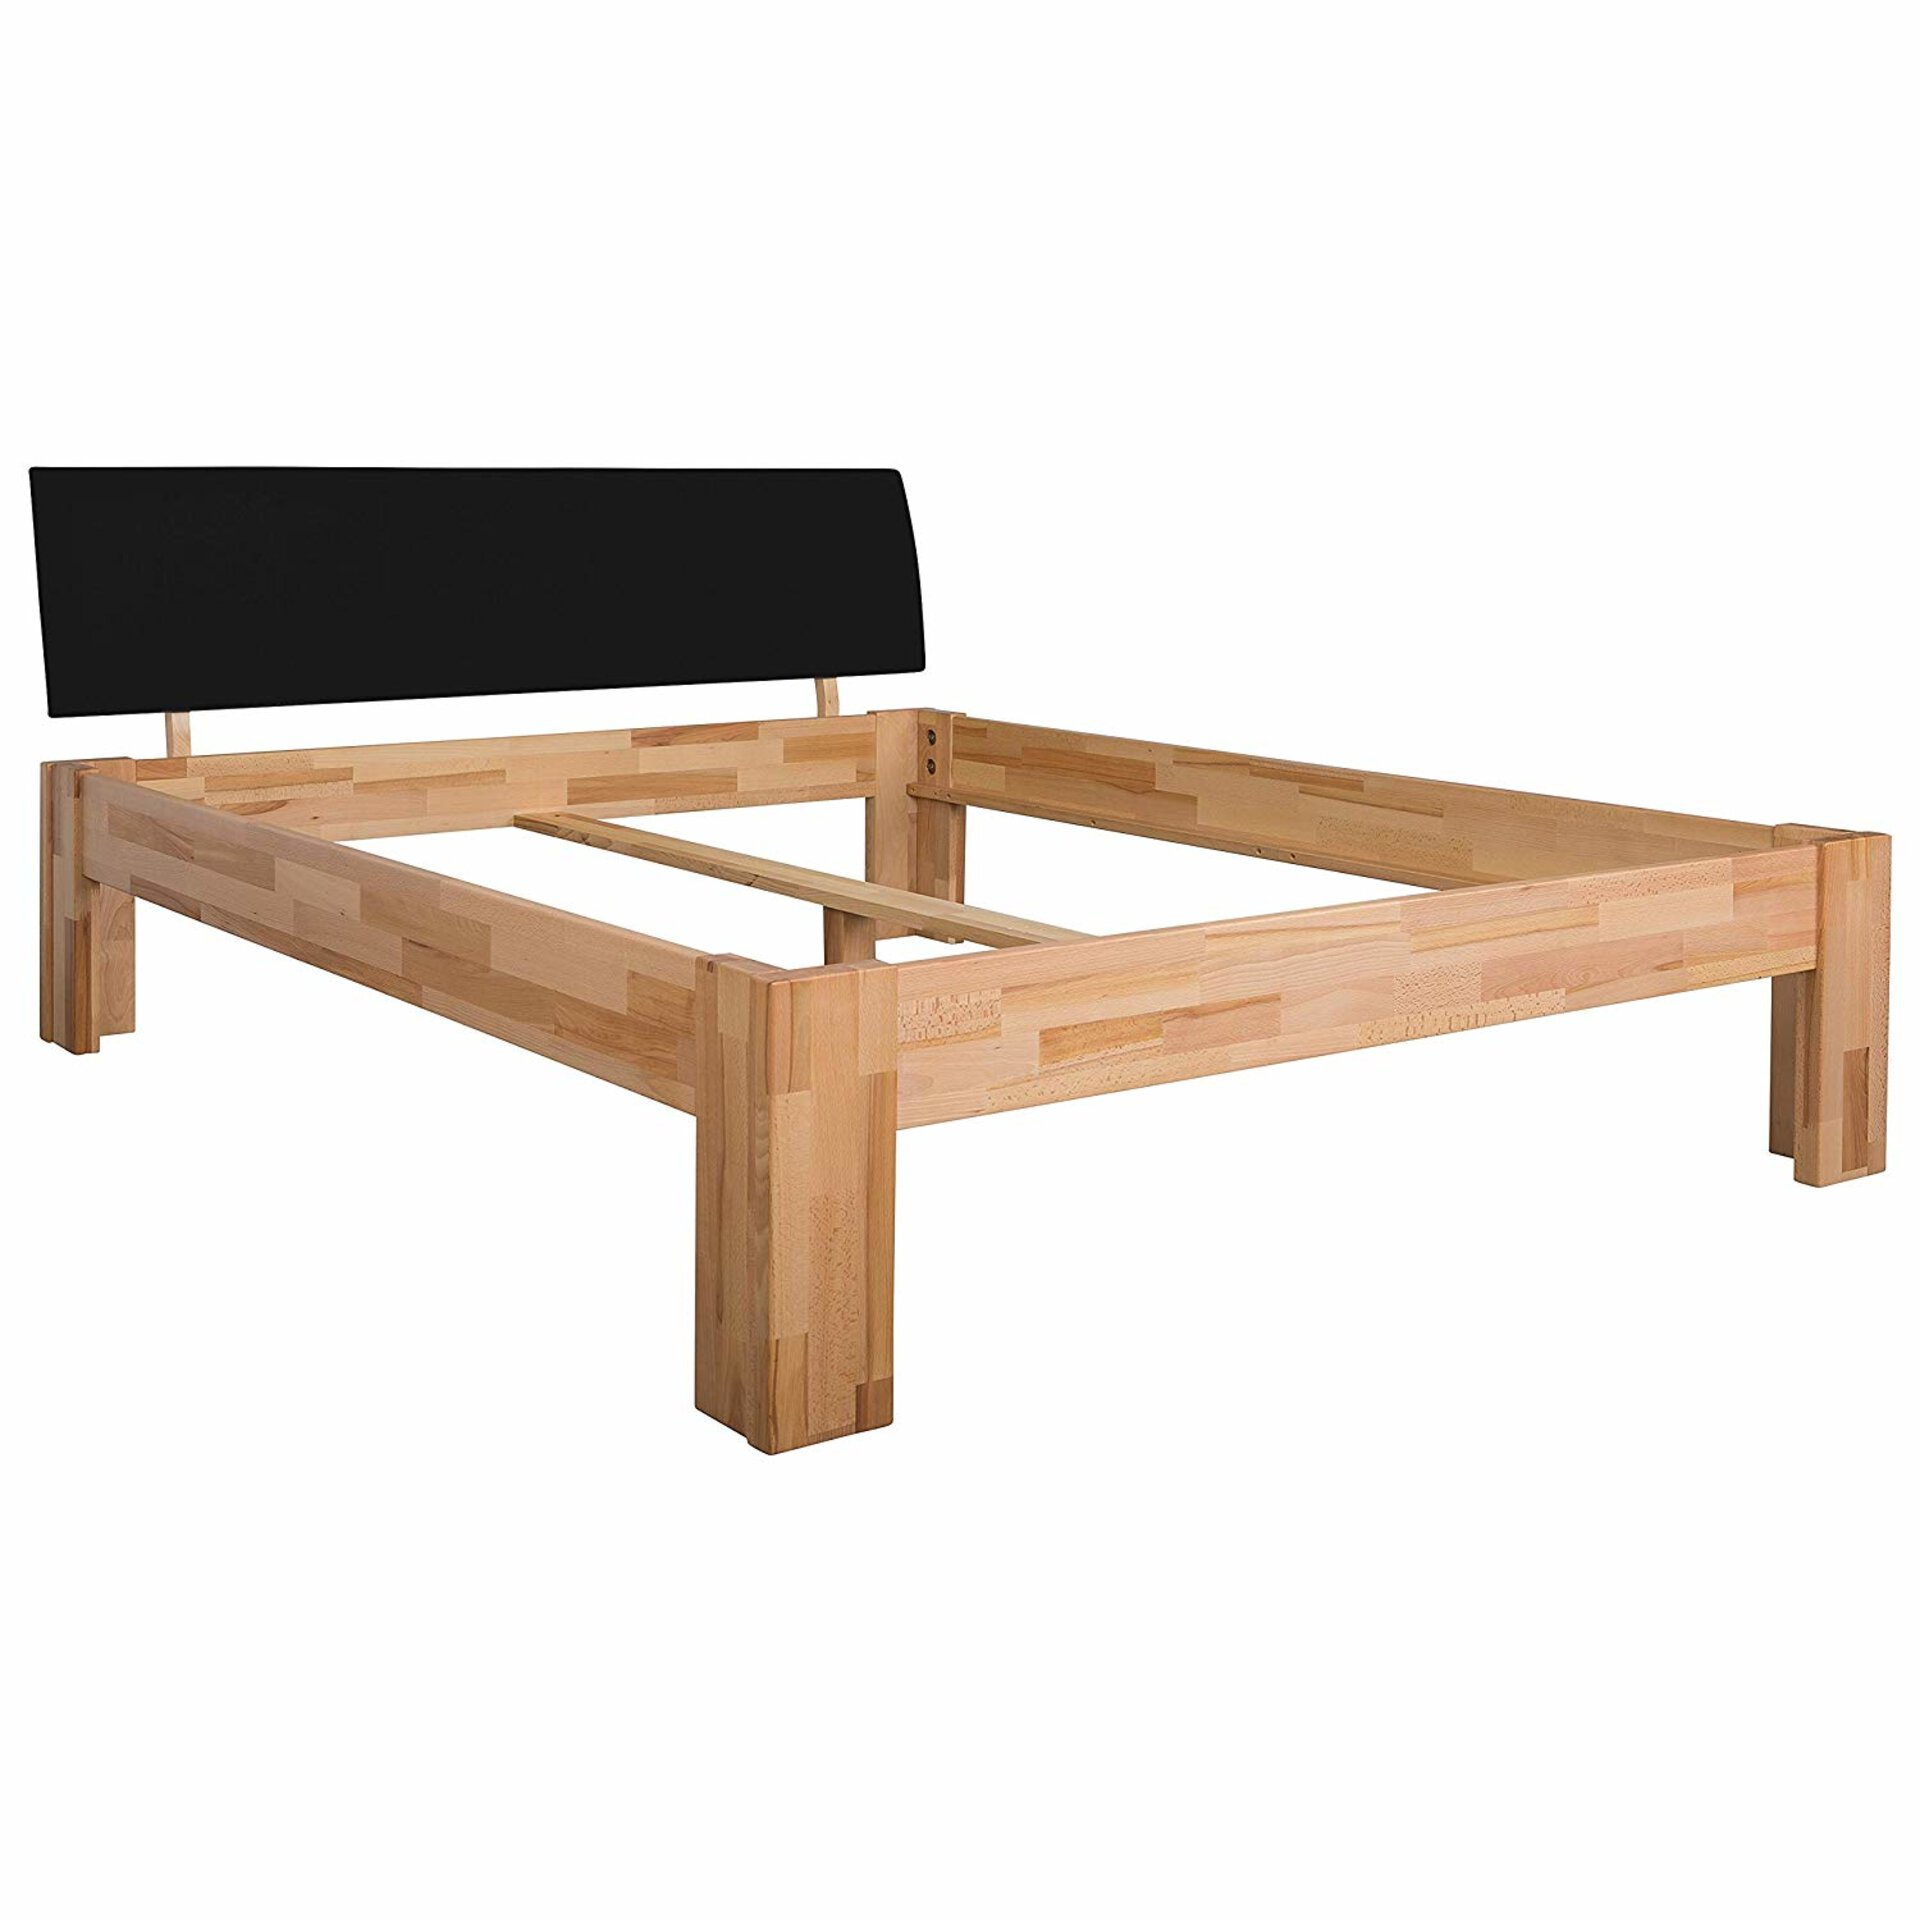 Bett MOZART Dreamoro Holz 180 x 99 x 200 cm